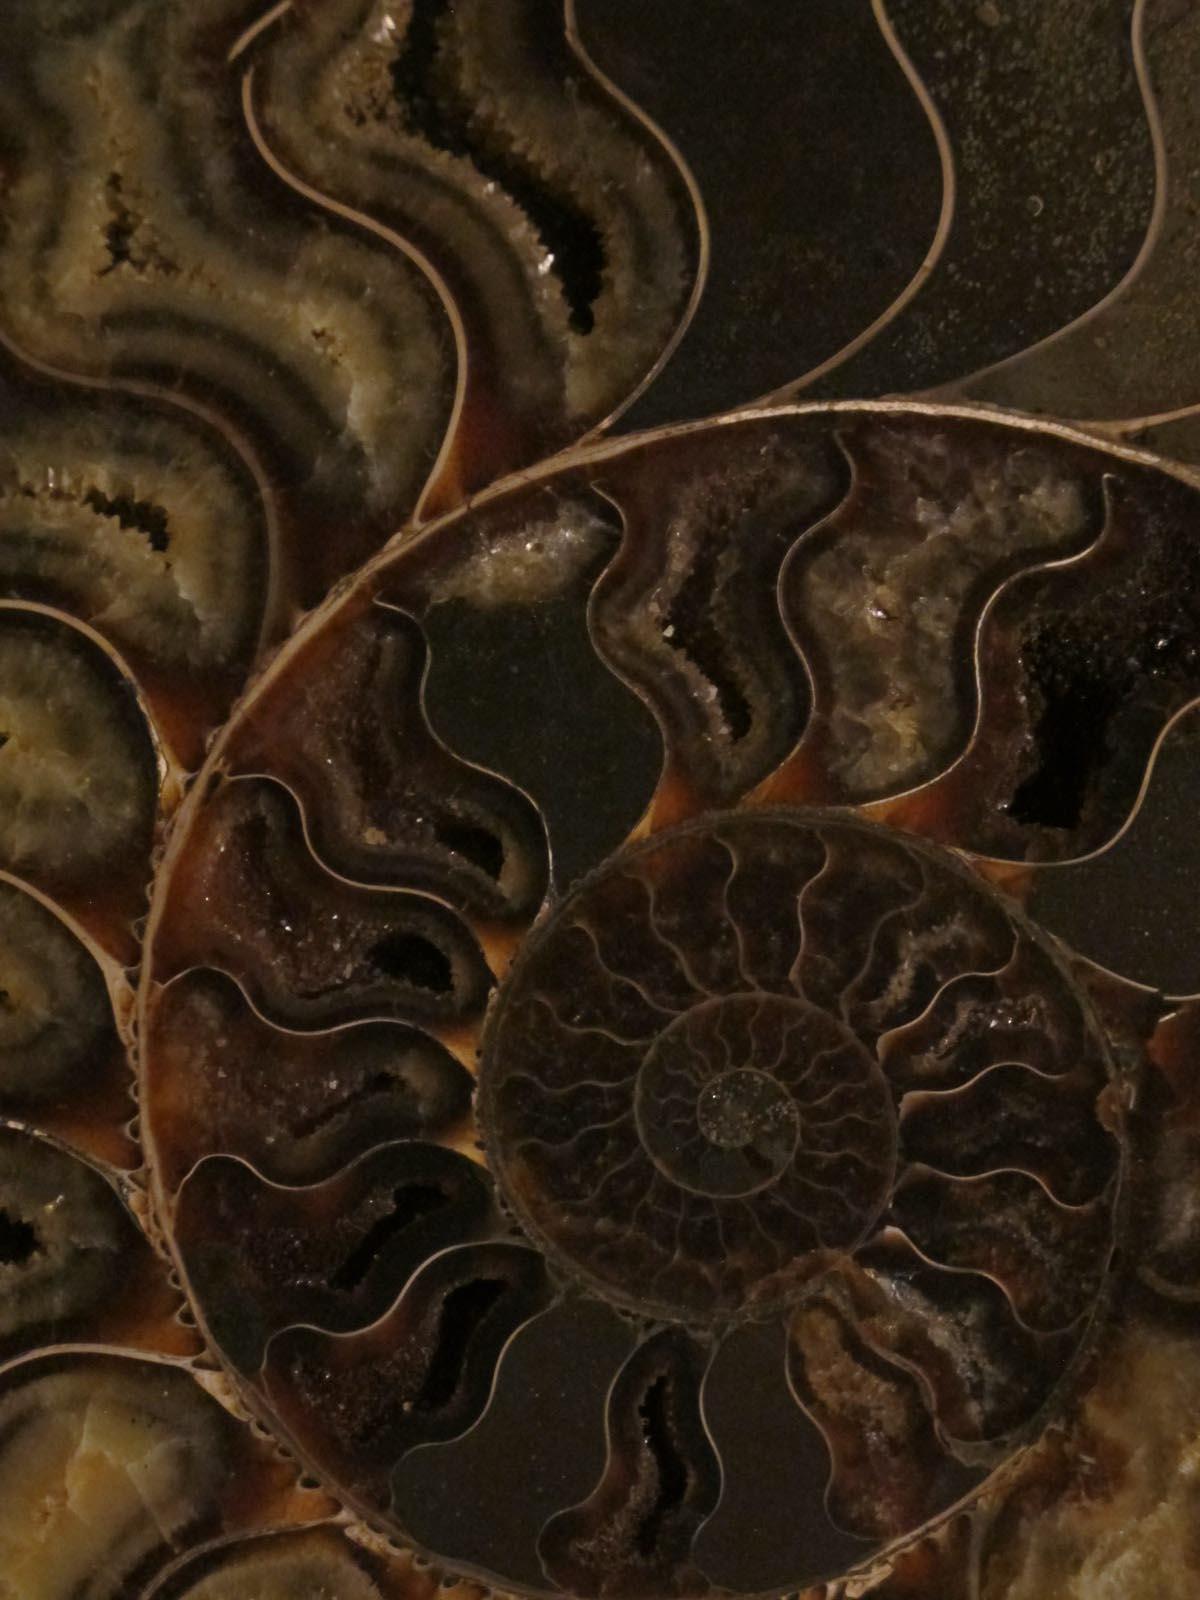 Fossils: Cleoniceras Ammonite, Madagascar